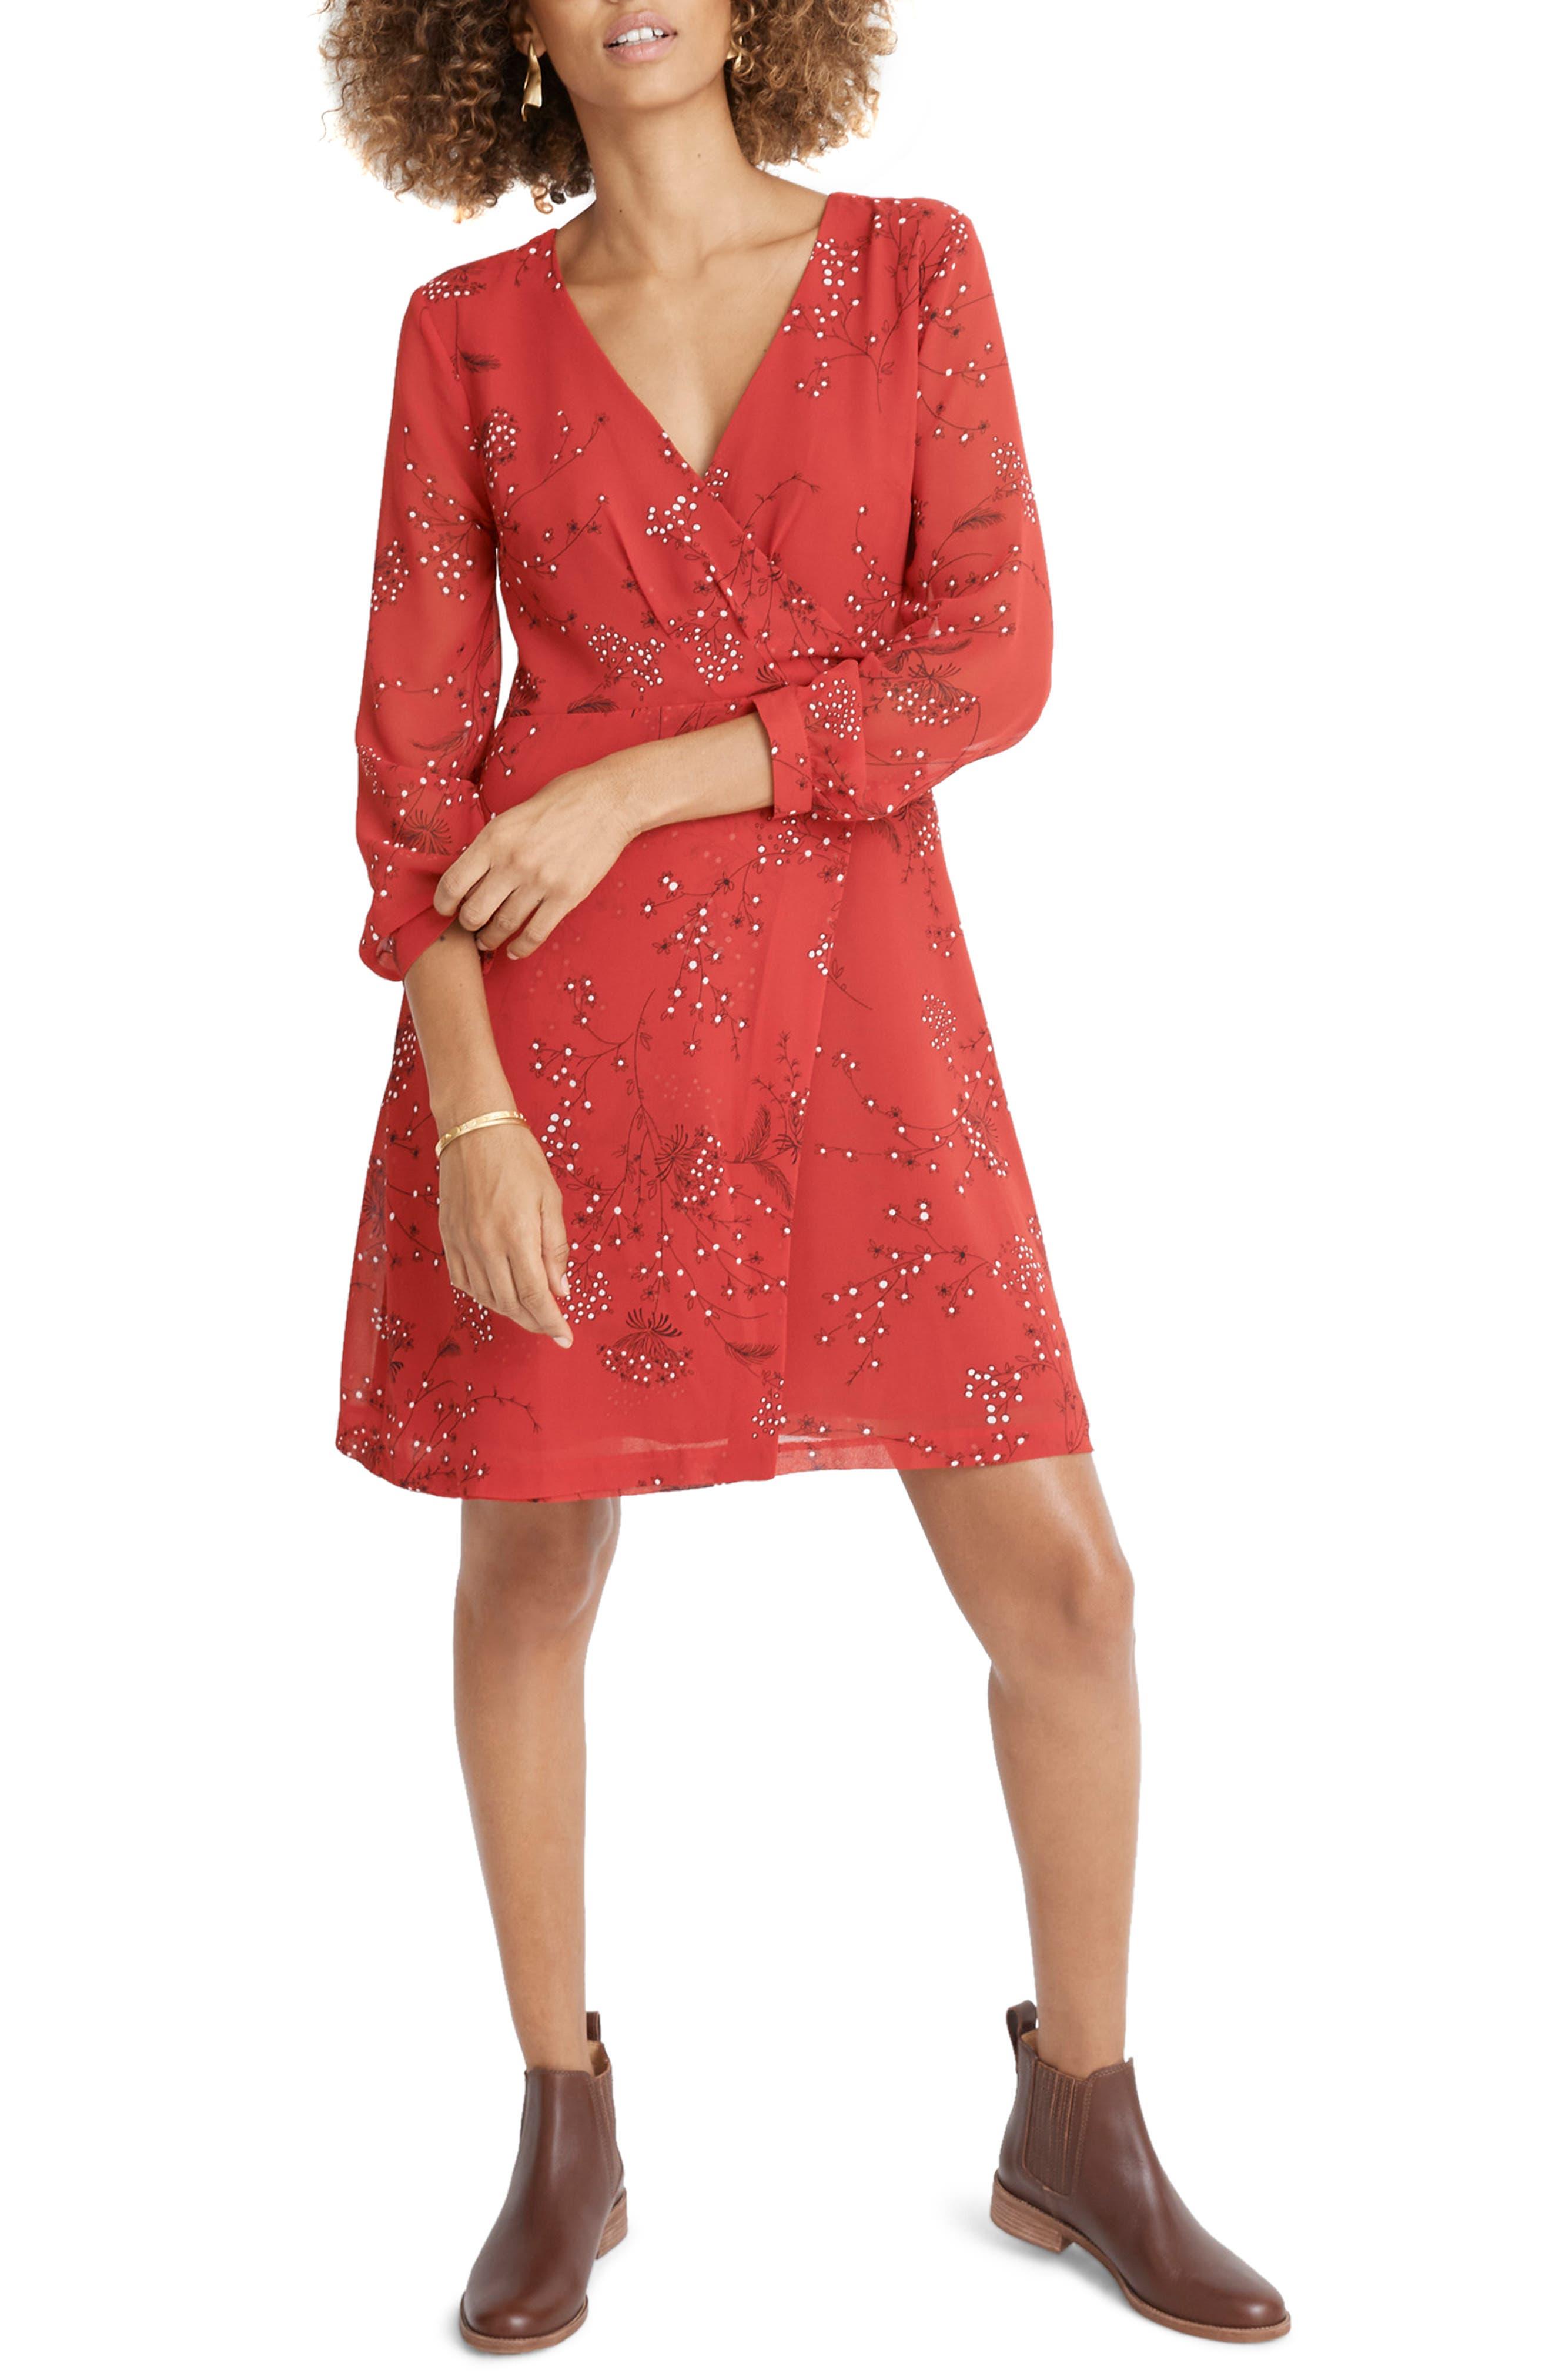 Madewell Hazelwood Faux Wrap Minidress, Red